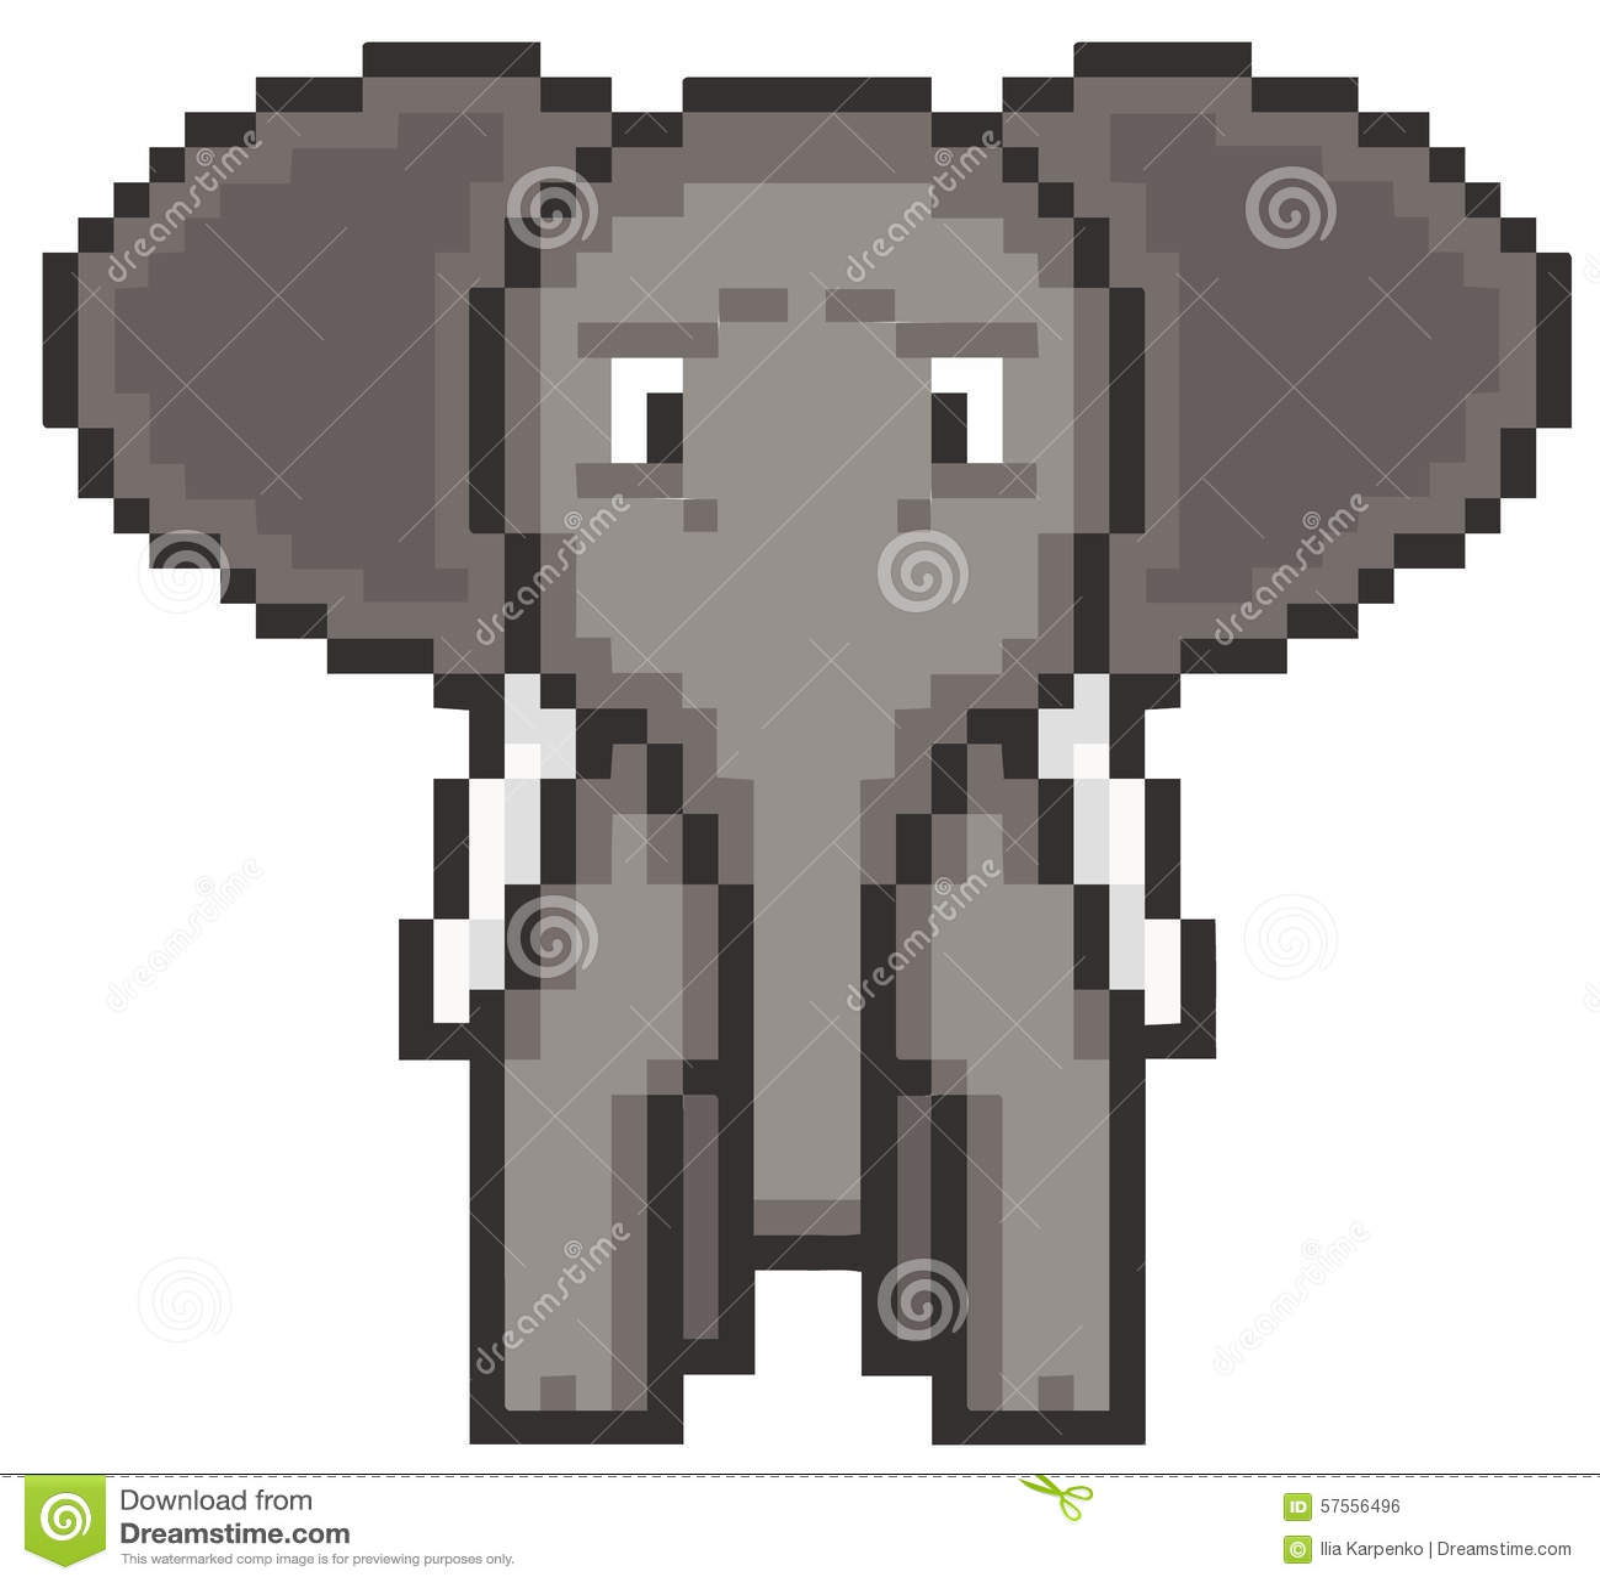 Pixel Art Elephant Stock Vector Illustration Of Pets 57556496